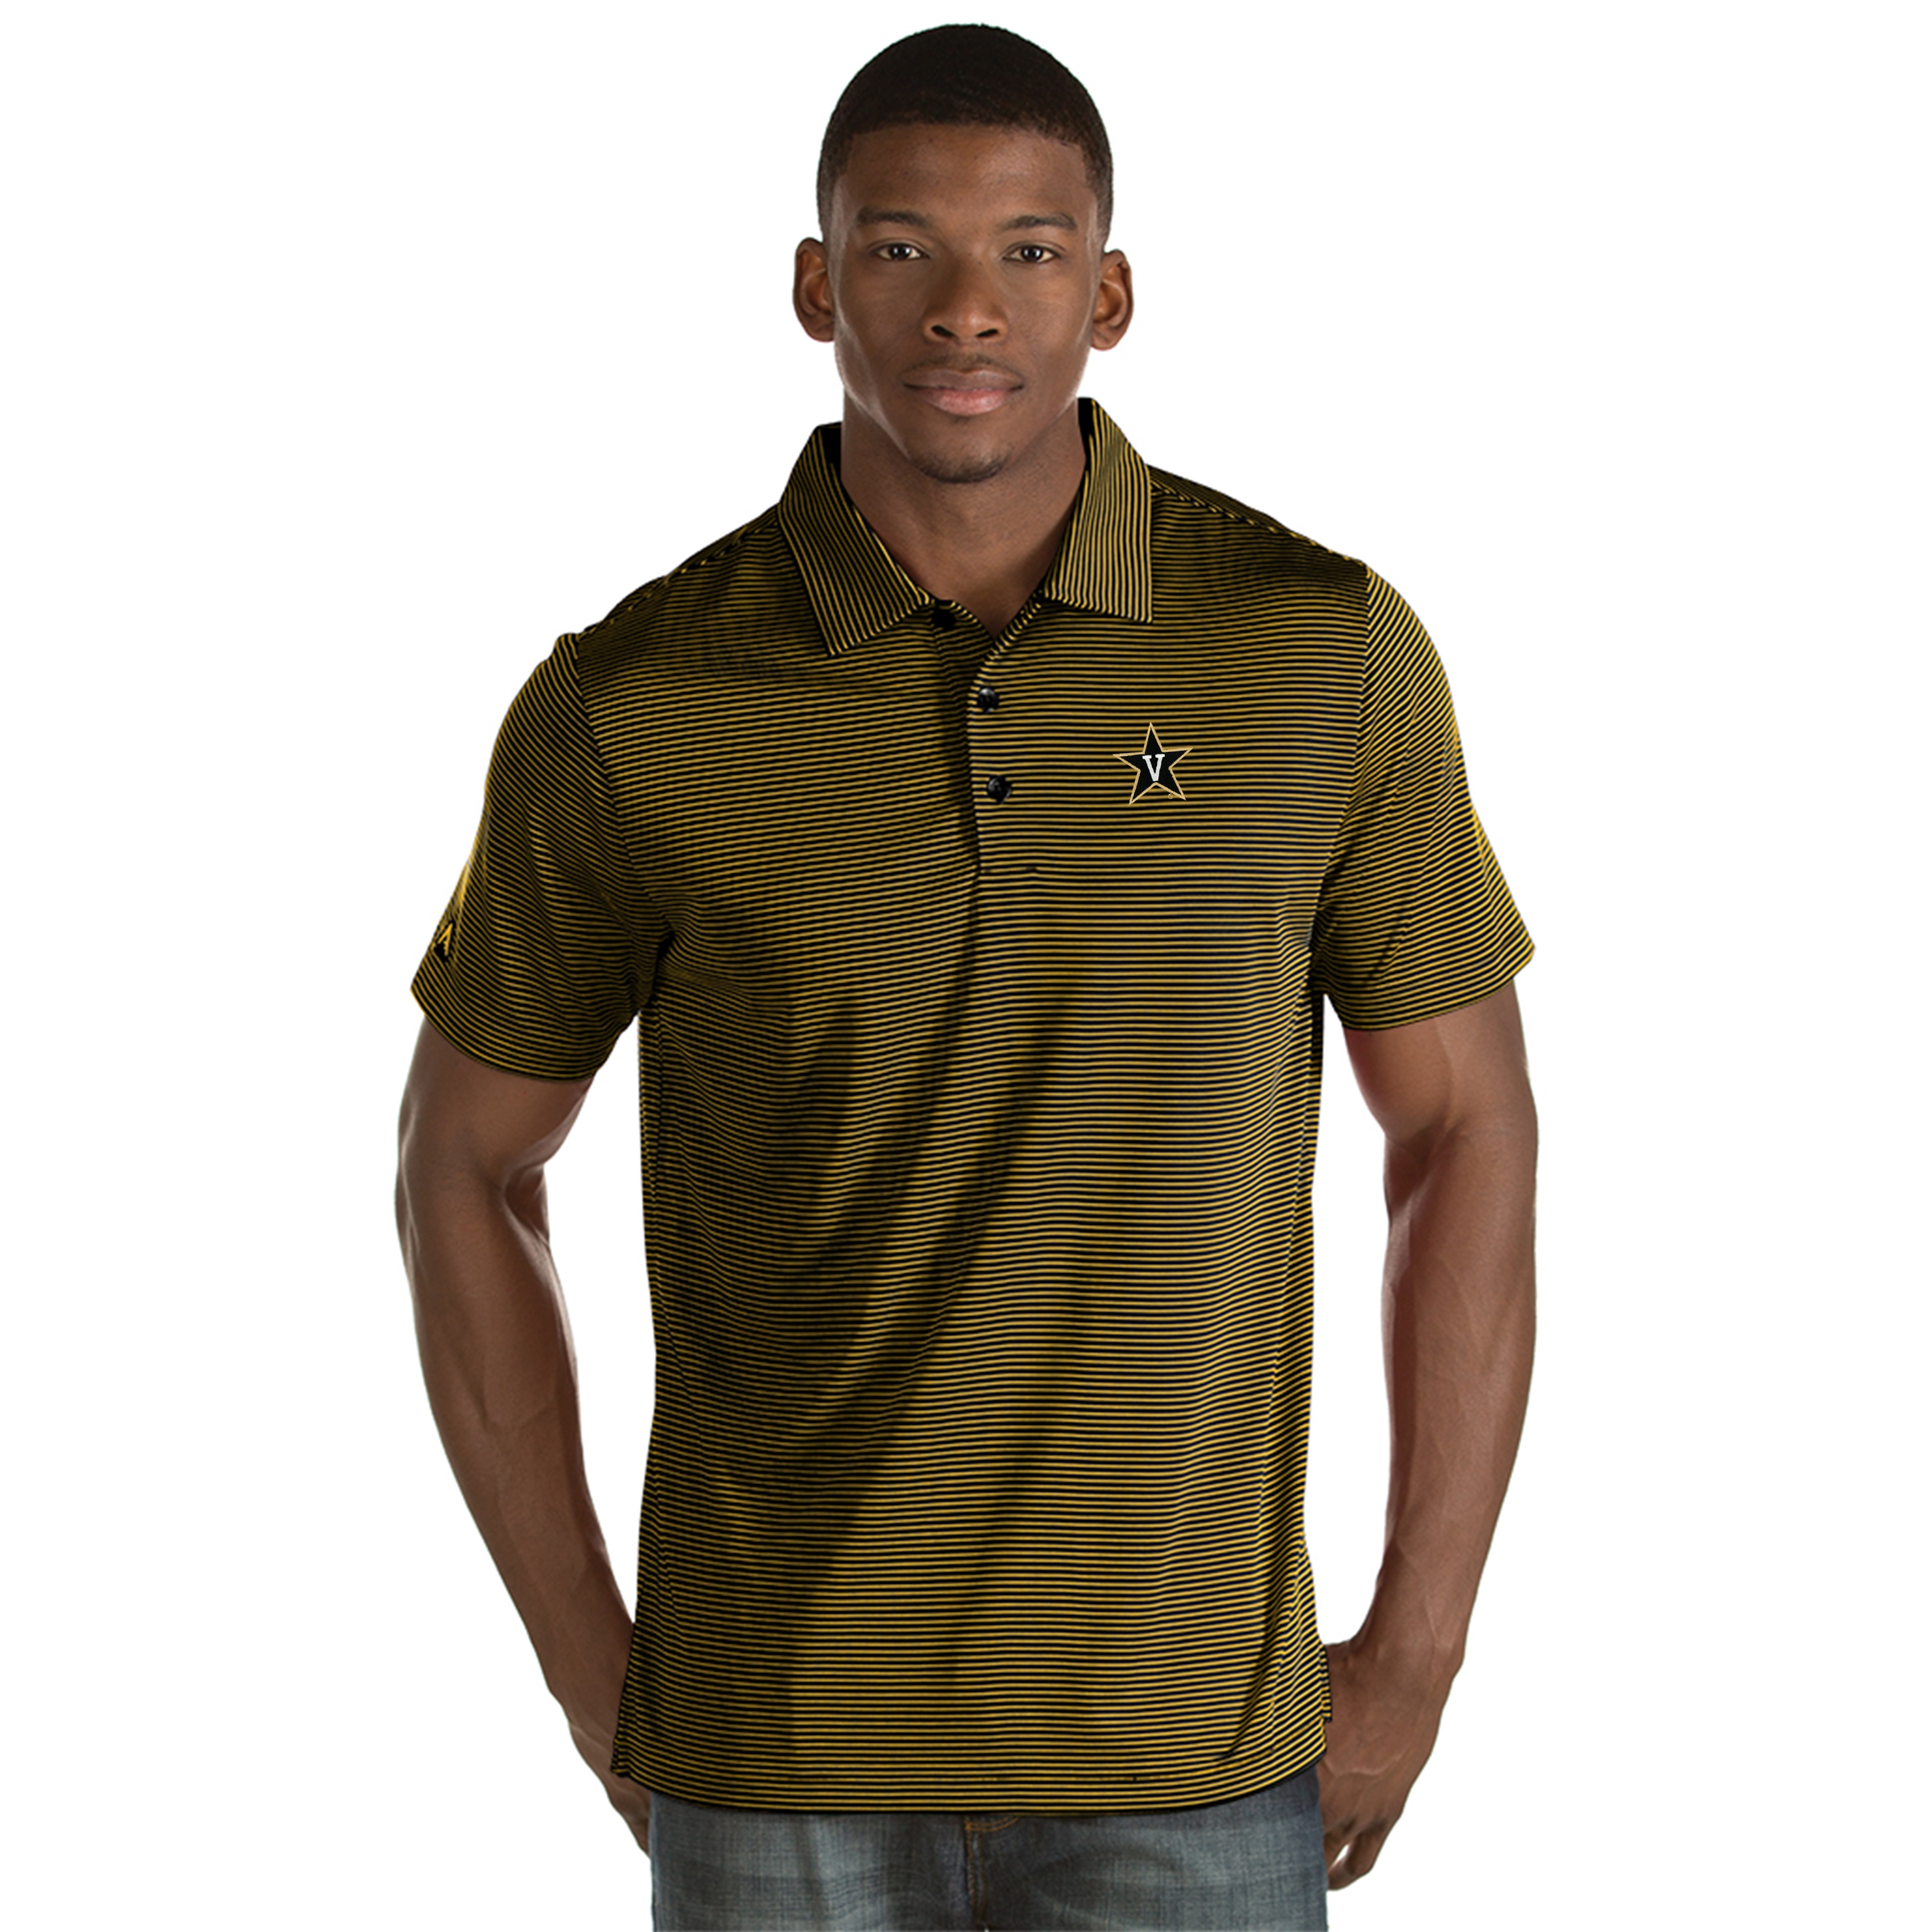 52e959241f Vanderbilt University Men's Quest Polo Shirt (Medium)